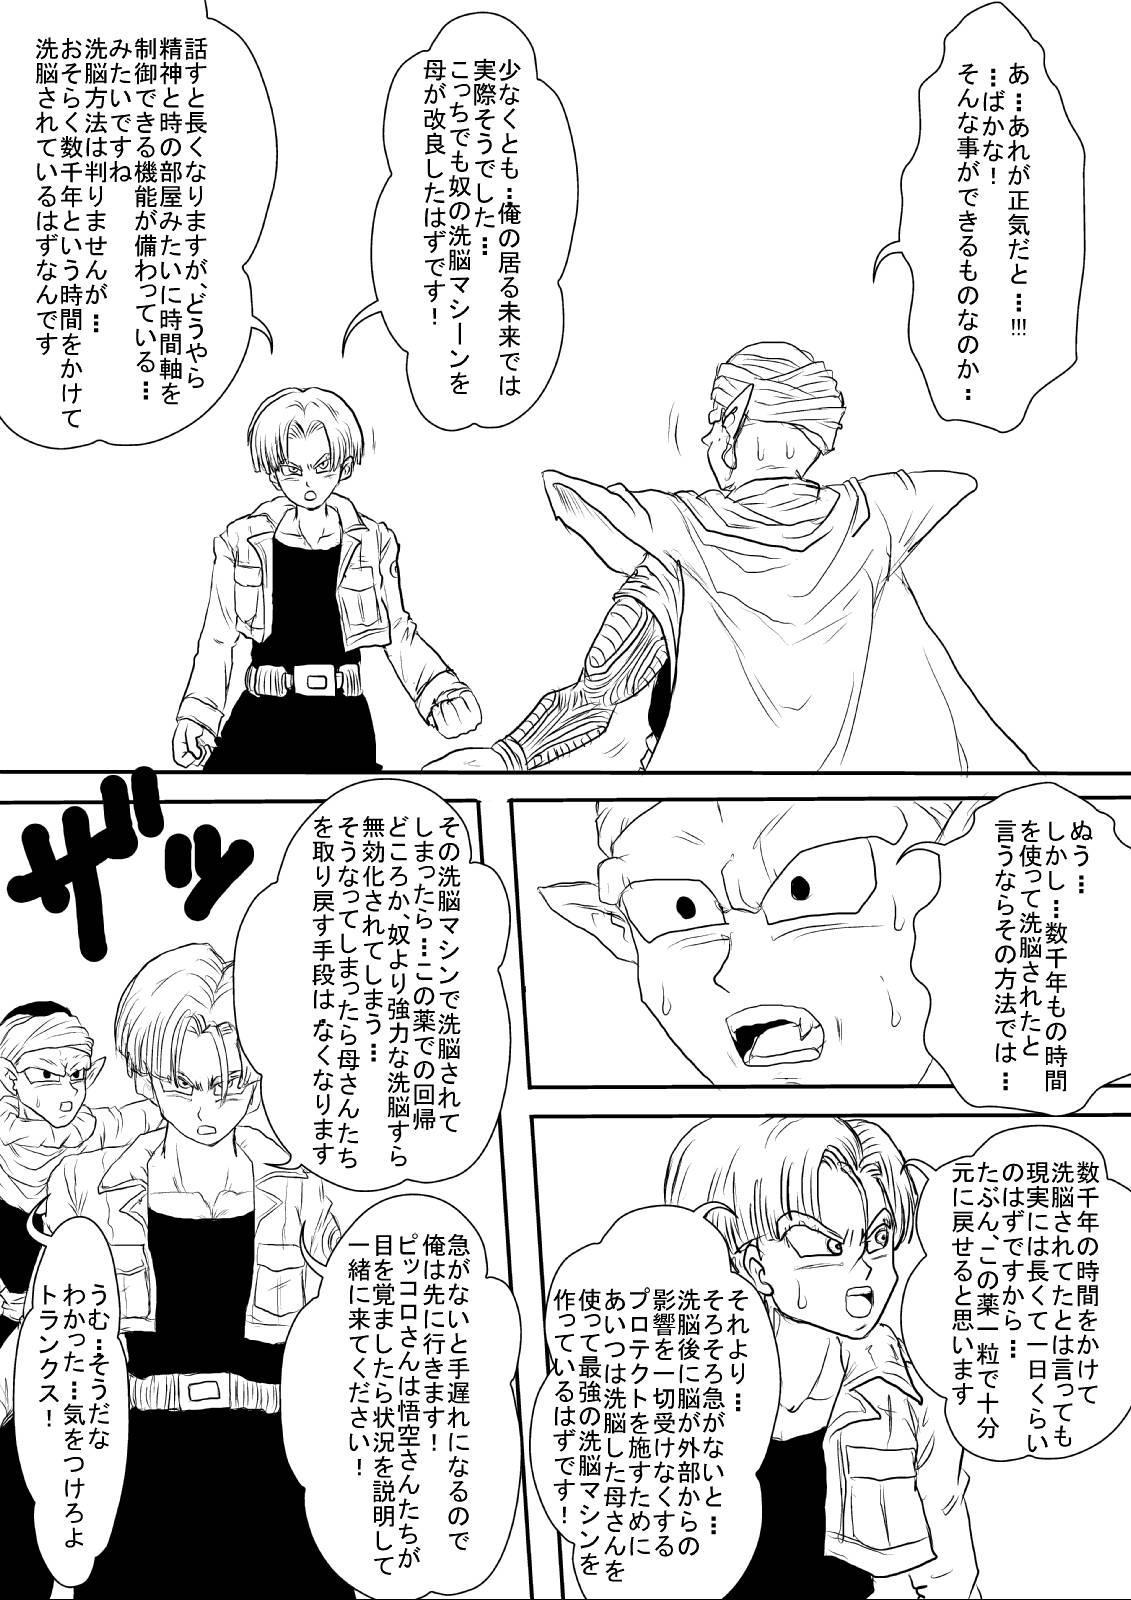 [Alice.Blood] Sennou Kyouiku-shitsu~ Jinzou ☆-kan 18-gou-hen (Dragon Ball Z) 11